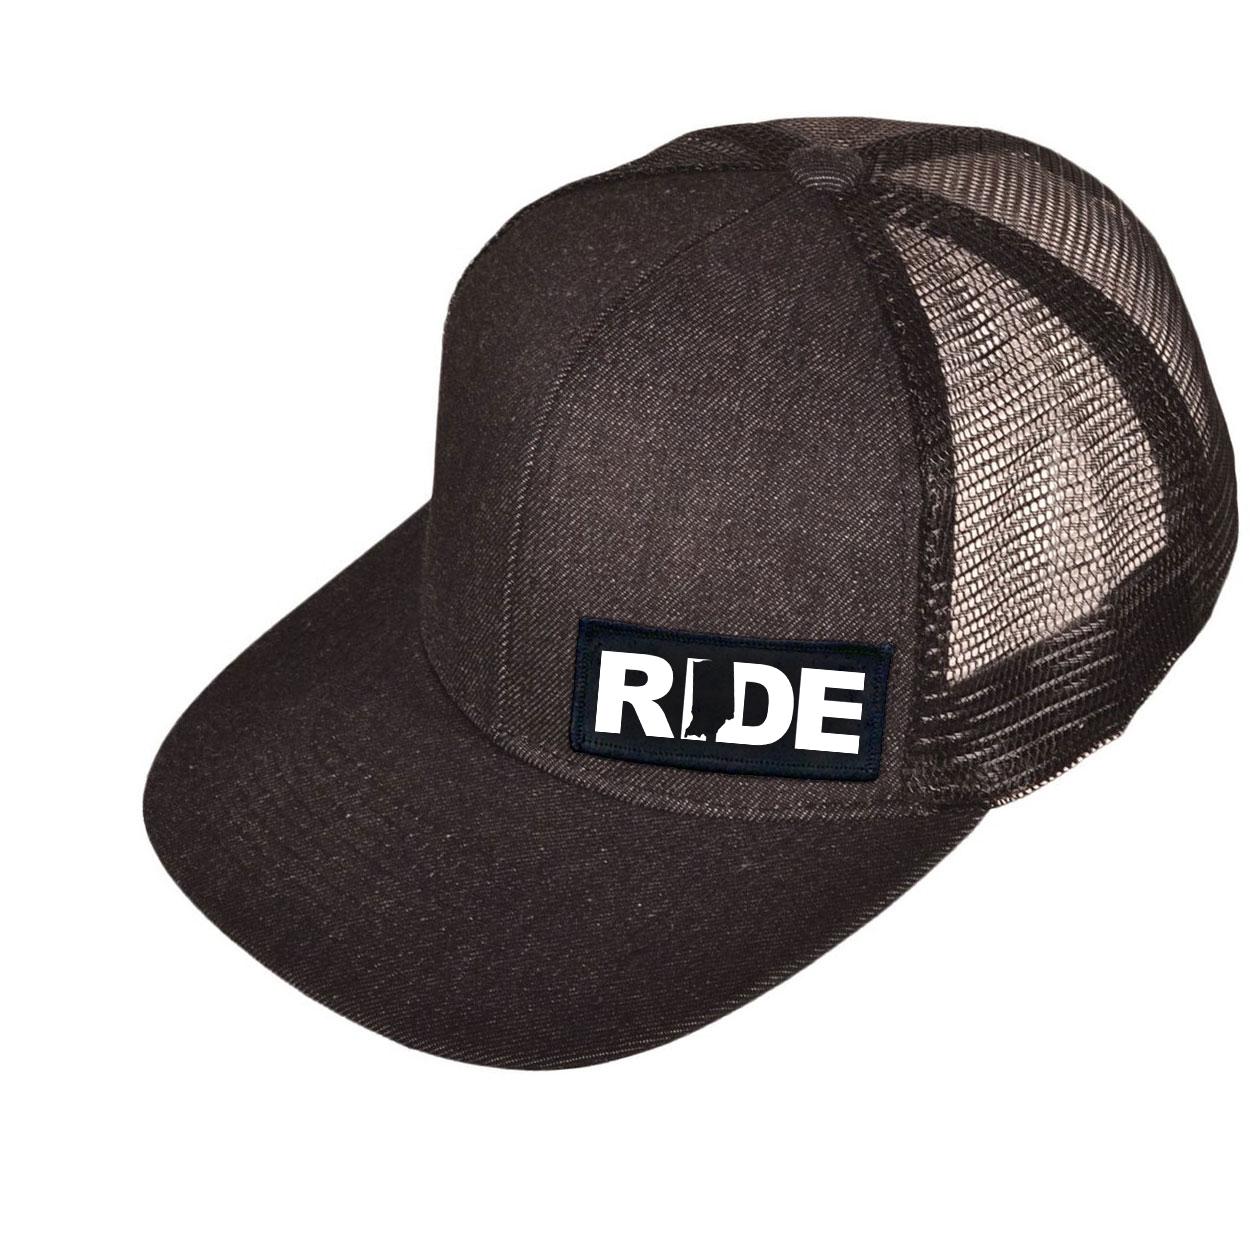 Ride Indiana Night Out Woven Patch Snapback Flat Brim Hat Black Denim (White Logo)